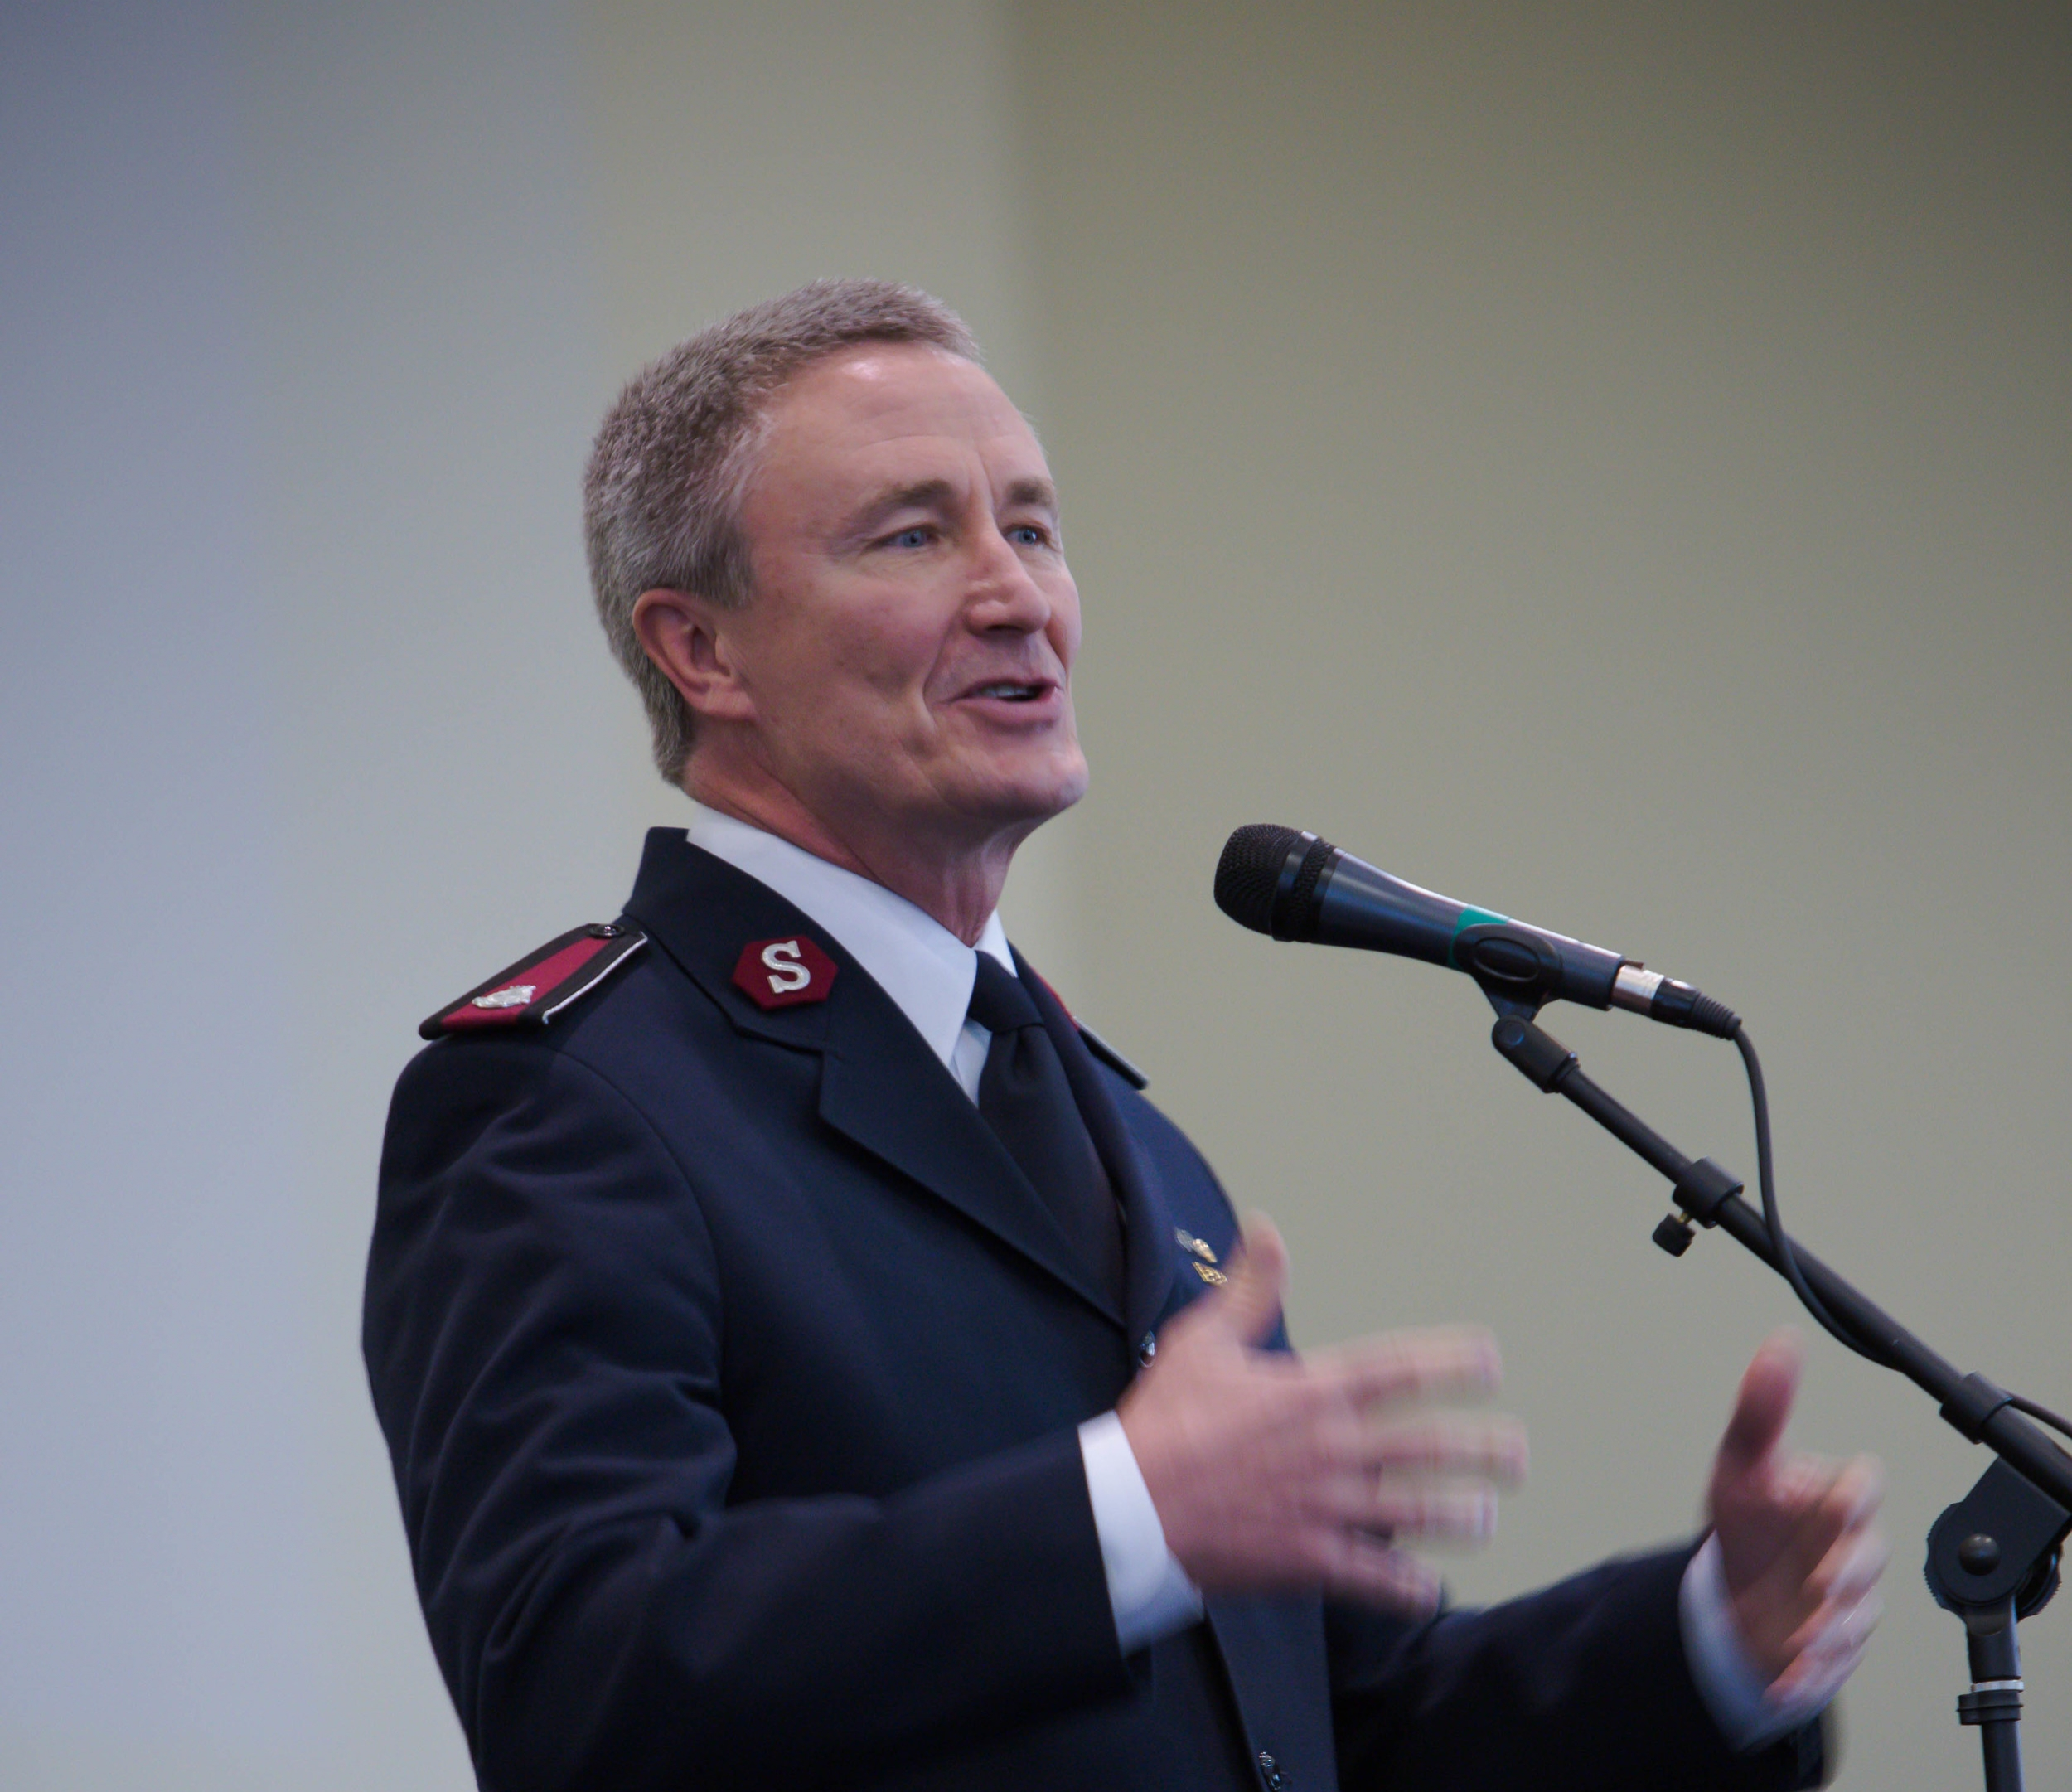 Executive Officer Lt. Colonel William Mockabee